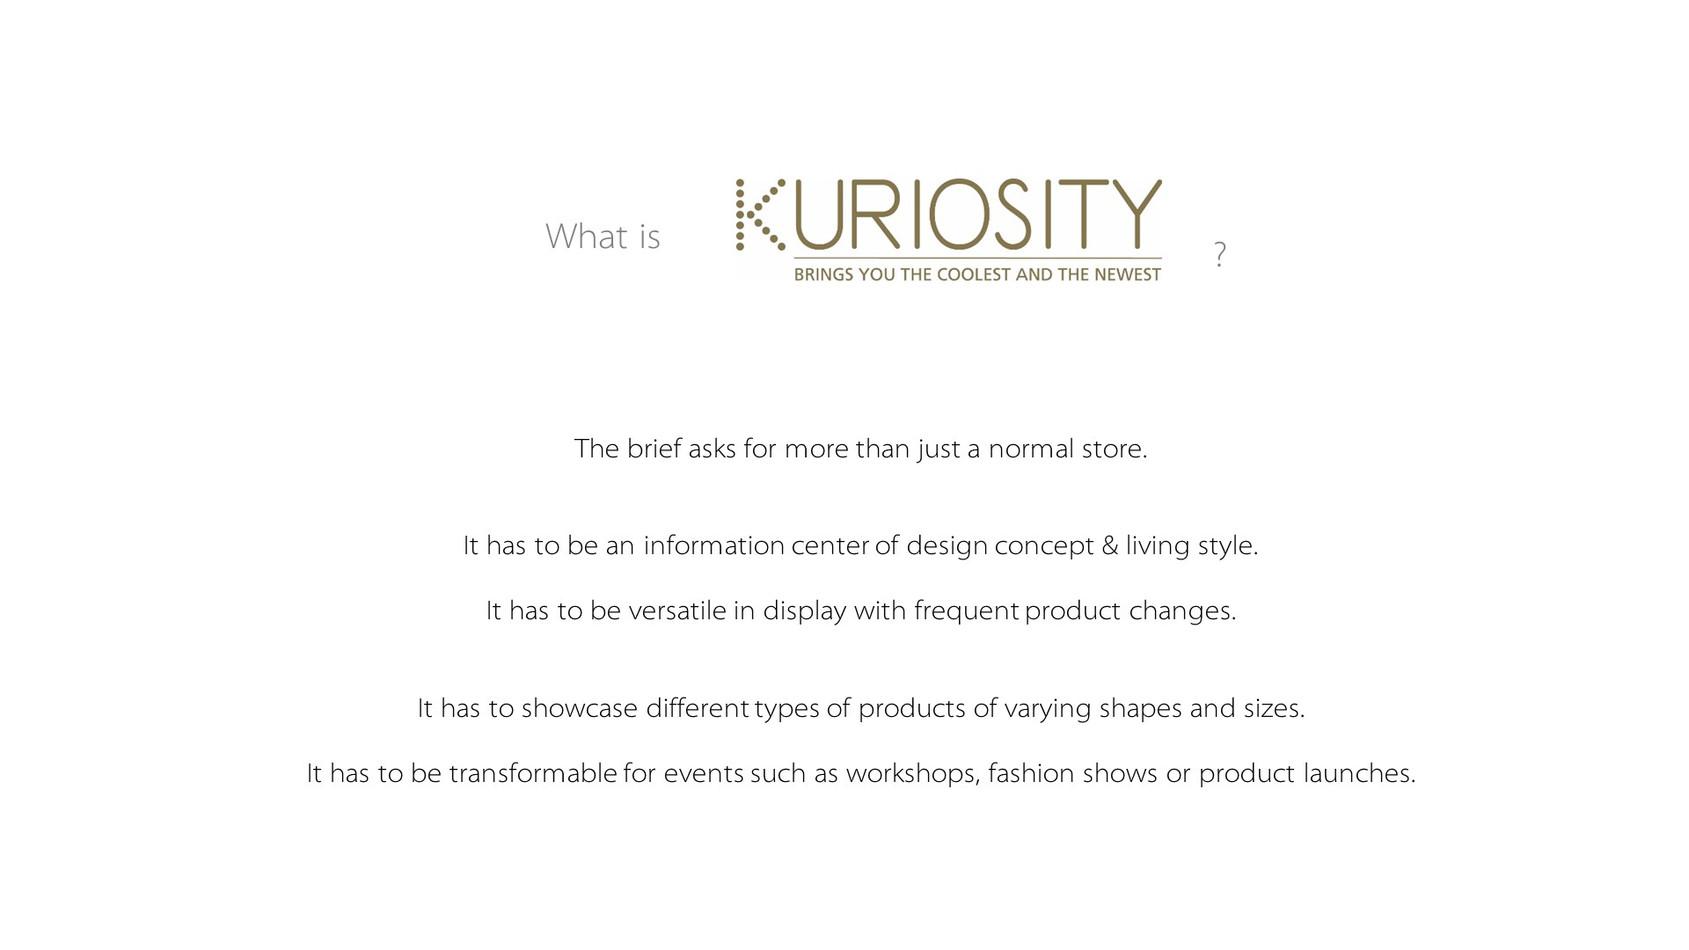 KURIOSITY-CONCEPT-STORE-EN01.JPG